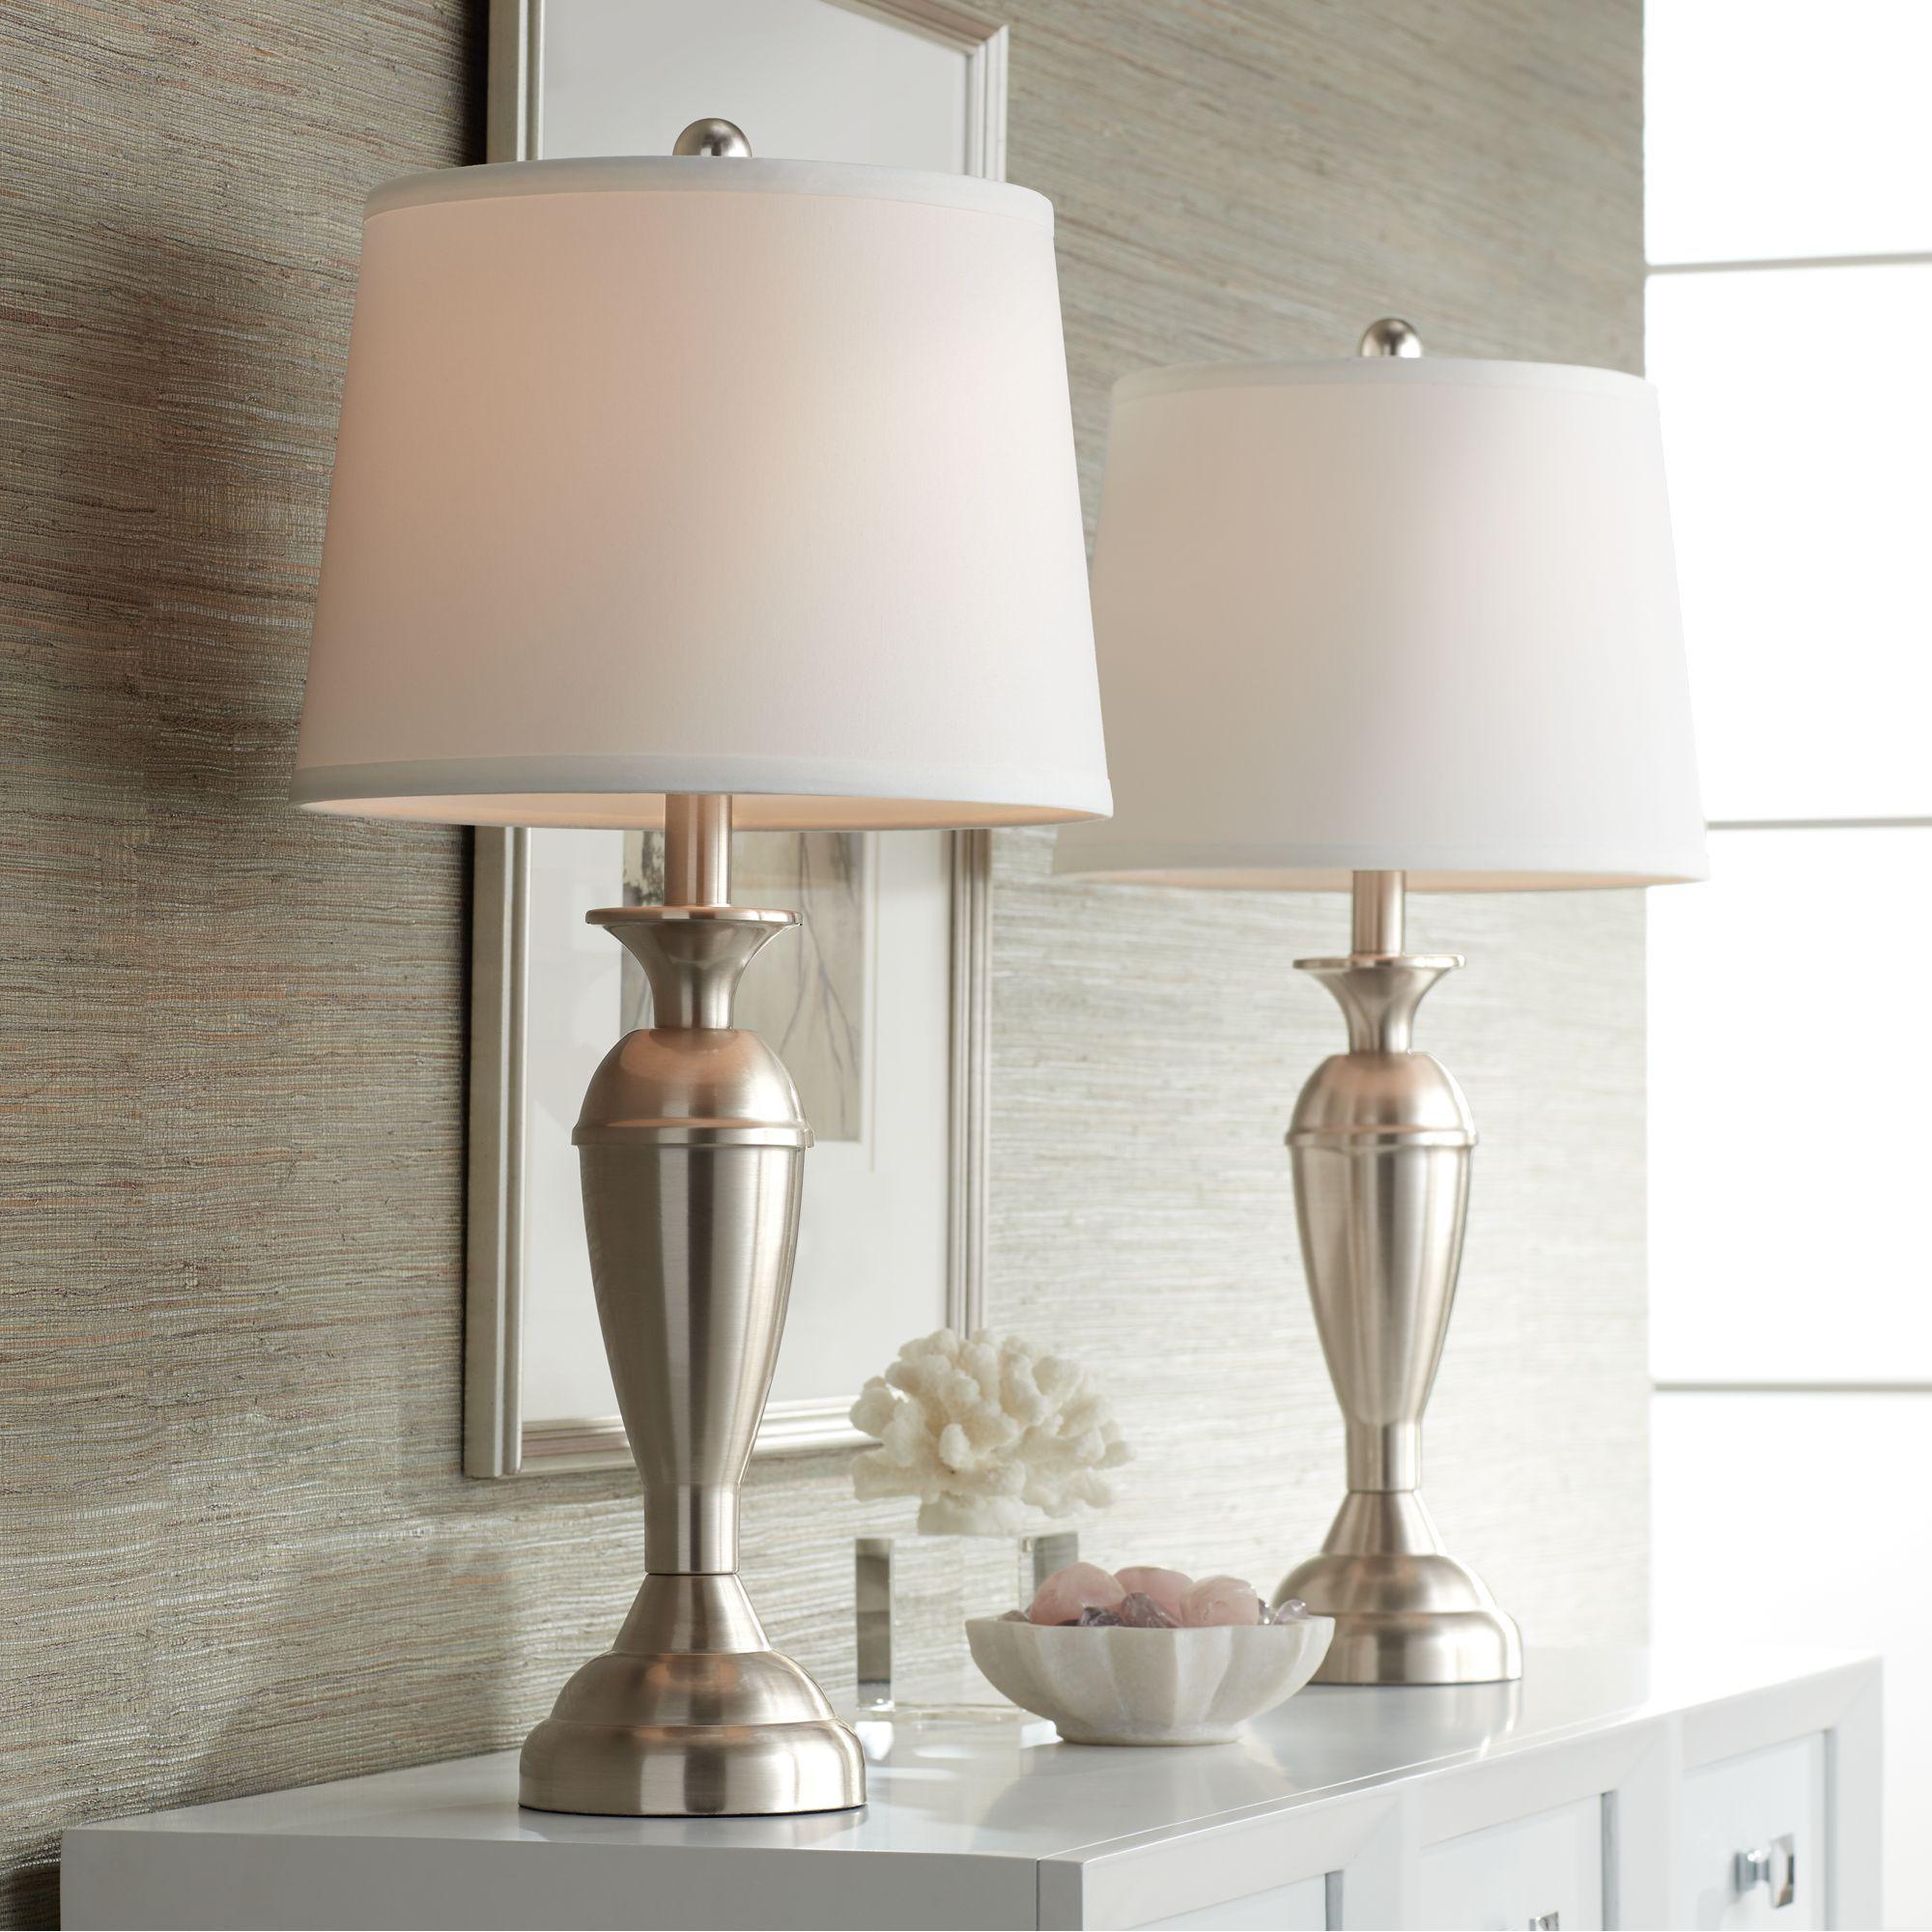 Regency Hill Modern Table Lamps Set Of 2 Brushed Steel Metal White Drum Shade For Living Room Family Bedroom Bedside Nightstand Walmart Com In 2020 Table Lamp Sets Modern Table Lamp Table Lamp #white #living #room #lamps